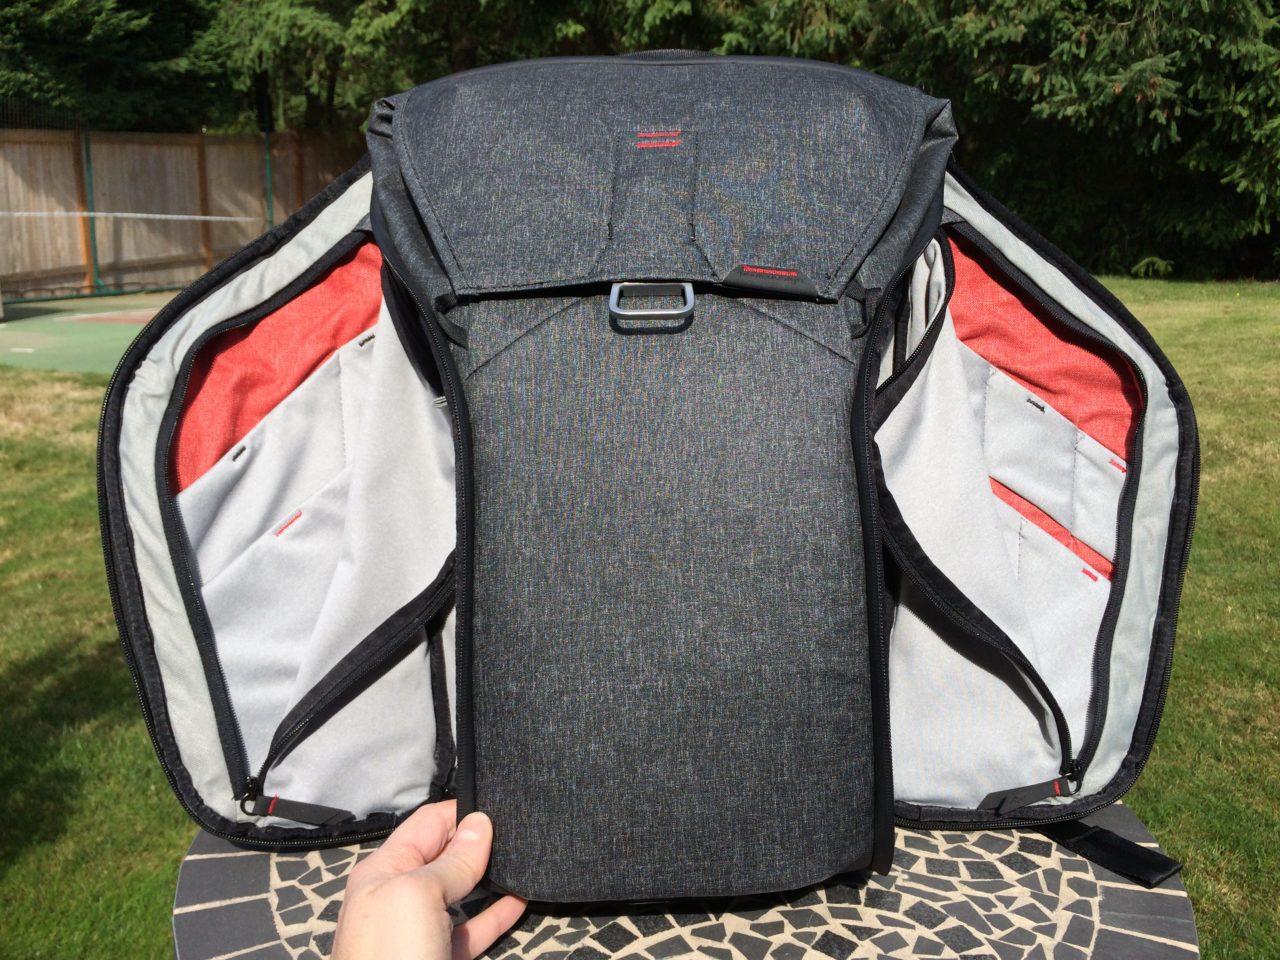 Peak Design Everyday Backpack organizer pockets